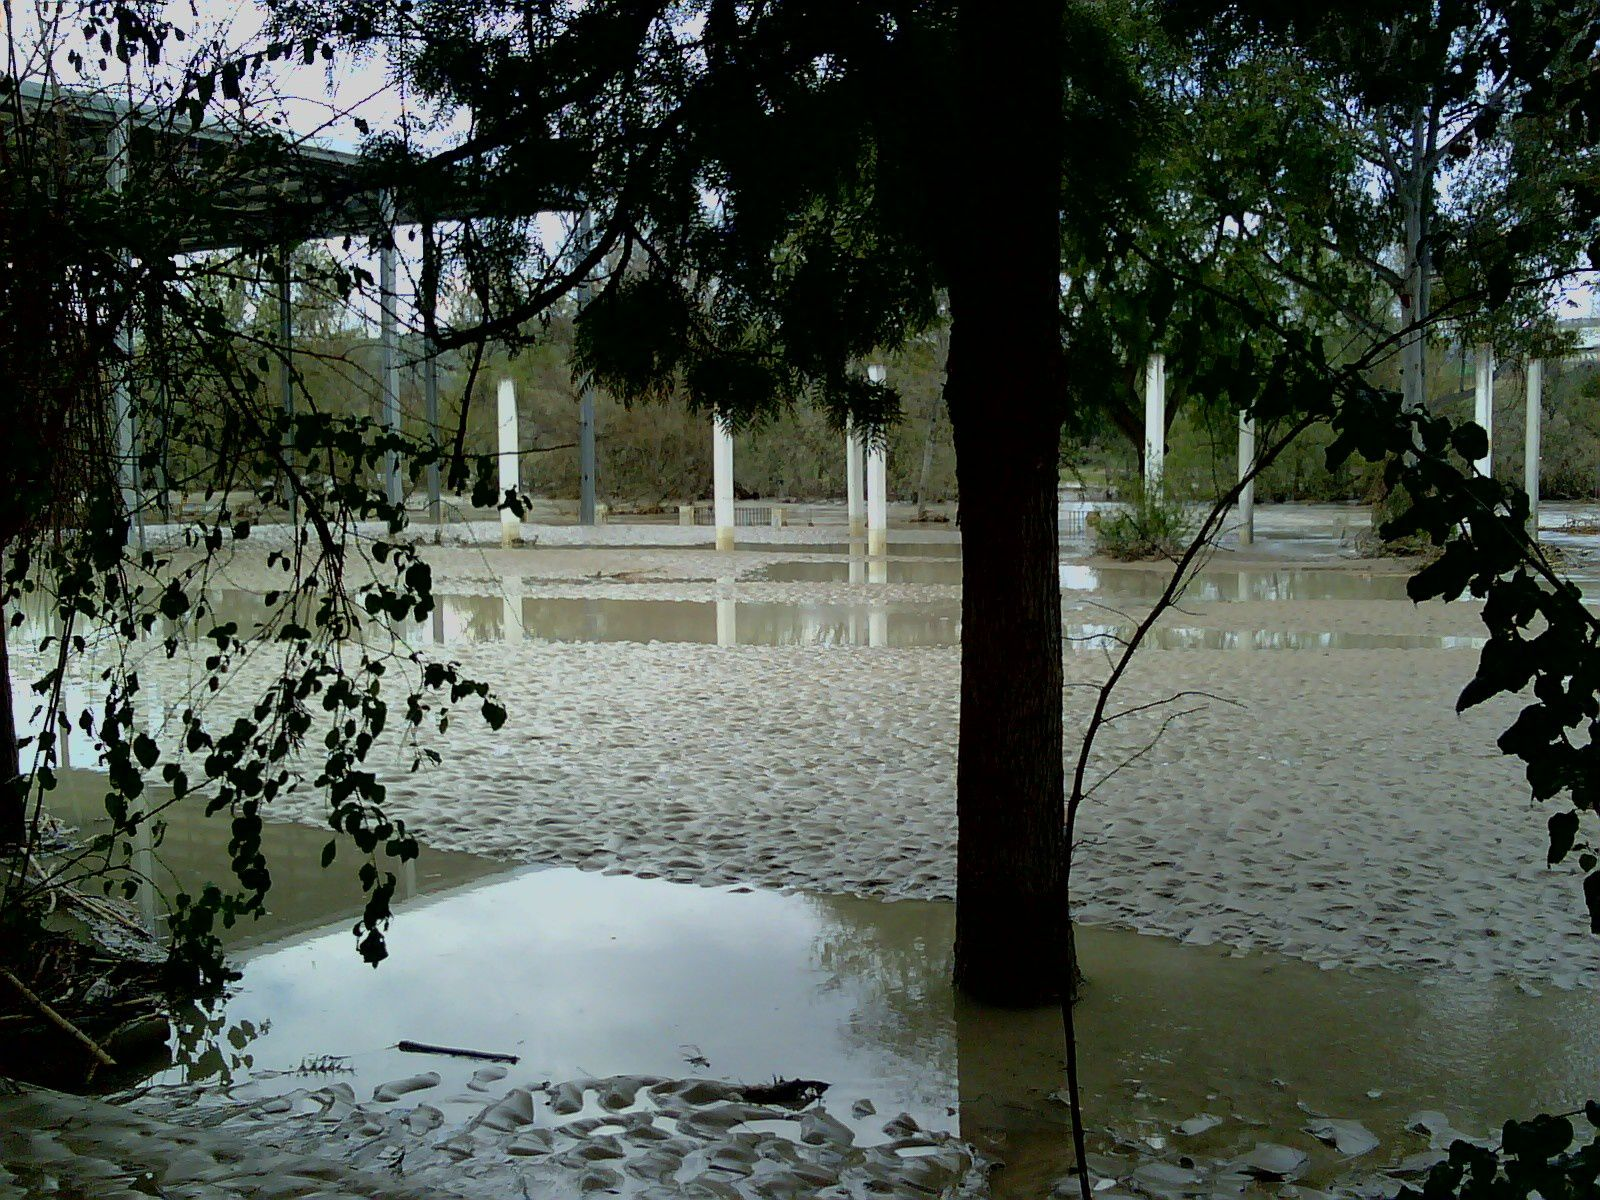 Badolatosa 13-03-2010